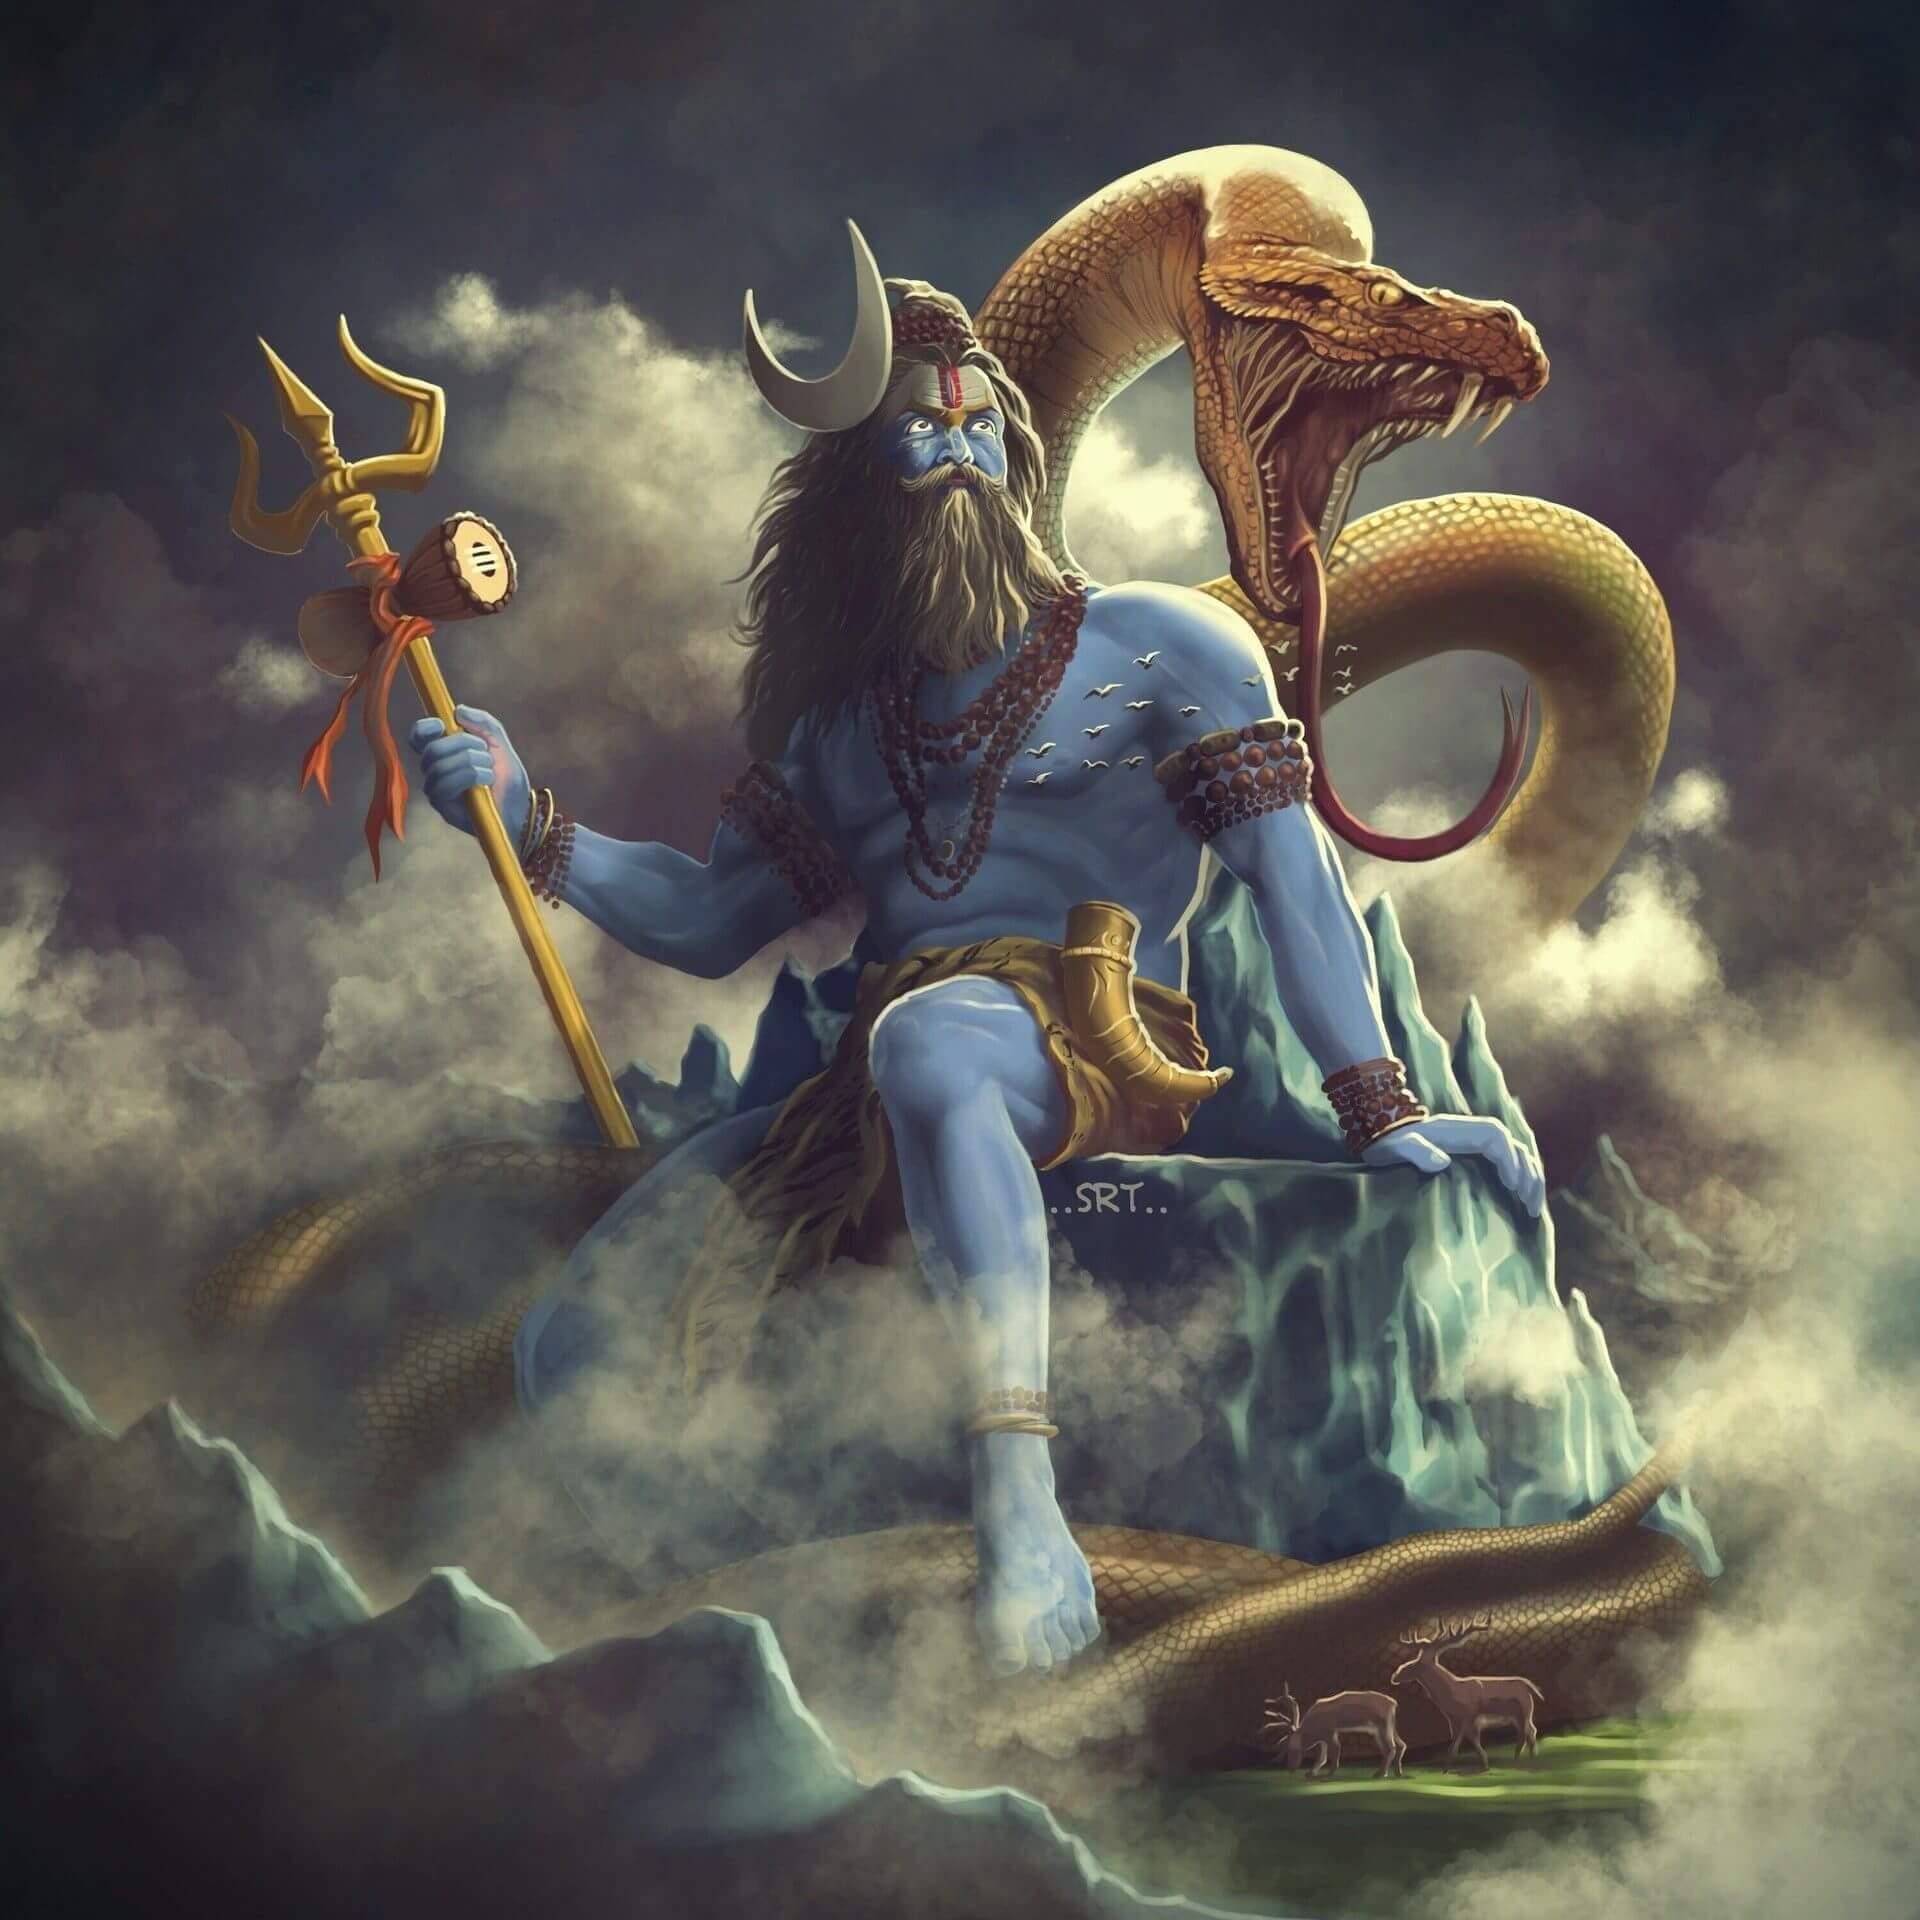 Jata Kata Hasambhrama Bhramanilimpanirjhari रावण रचित शिव तांडव स्तोत्र बोल और अर्थ Shiv Tandav Lyrics And Meaning Made By Ravan (5)